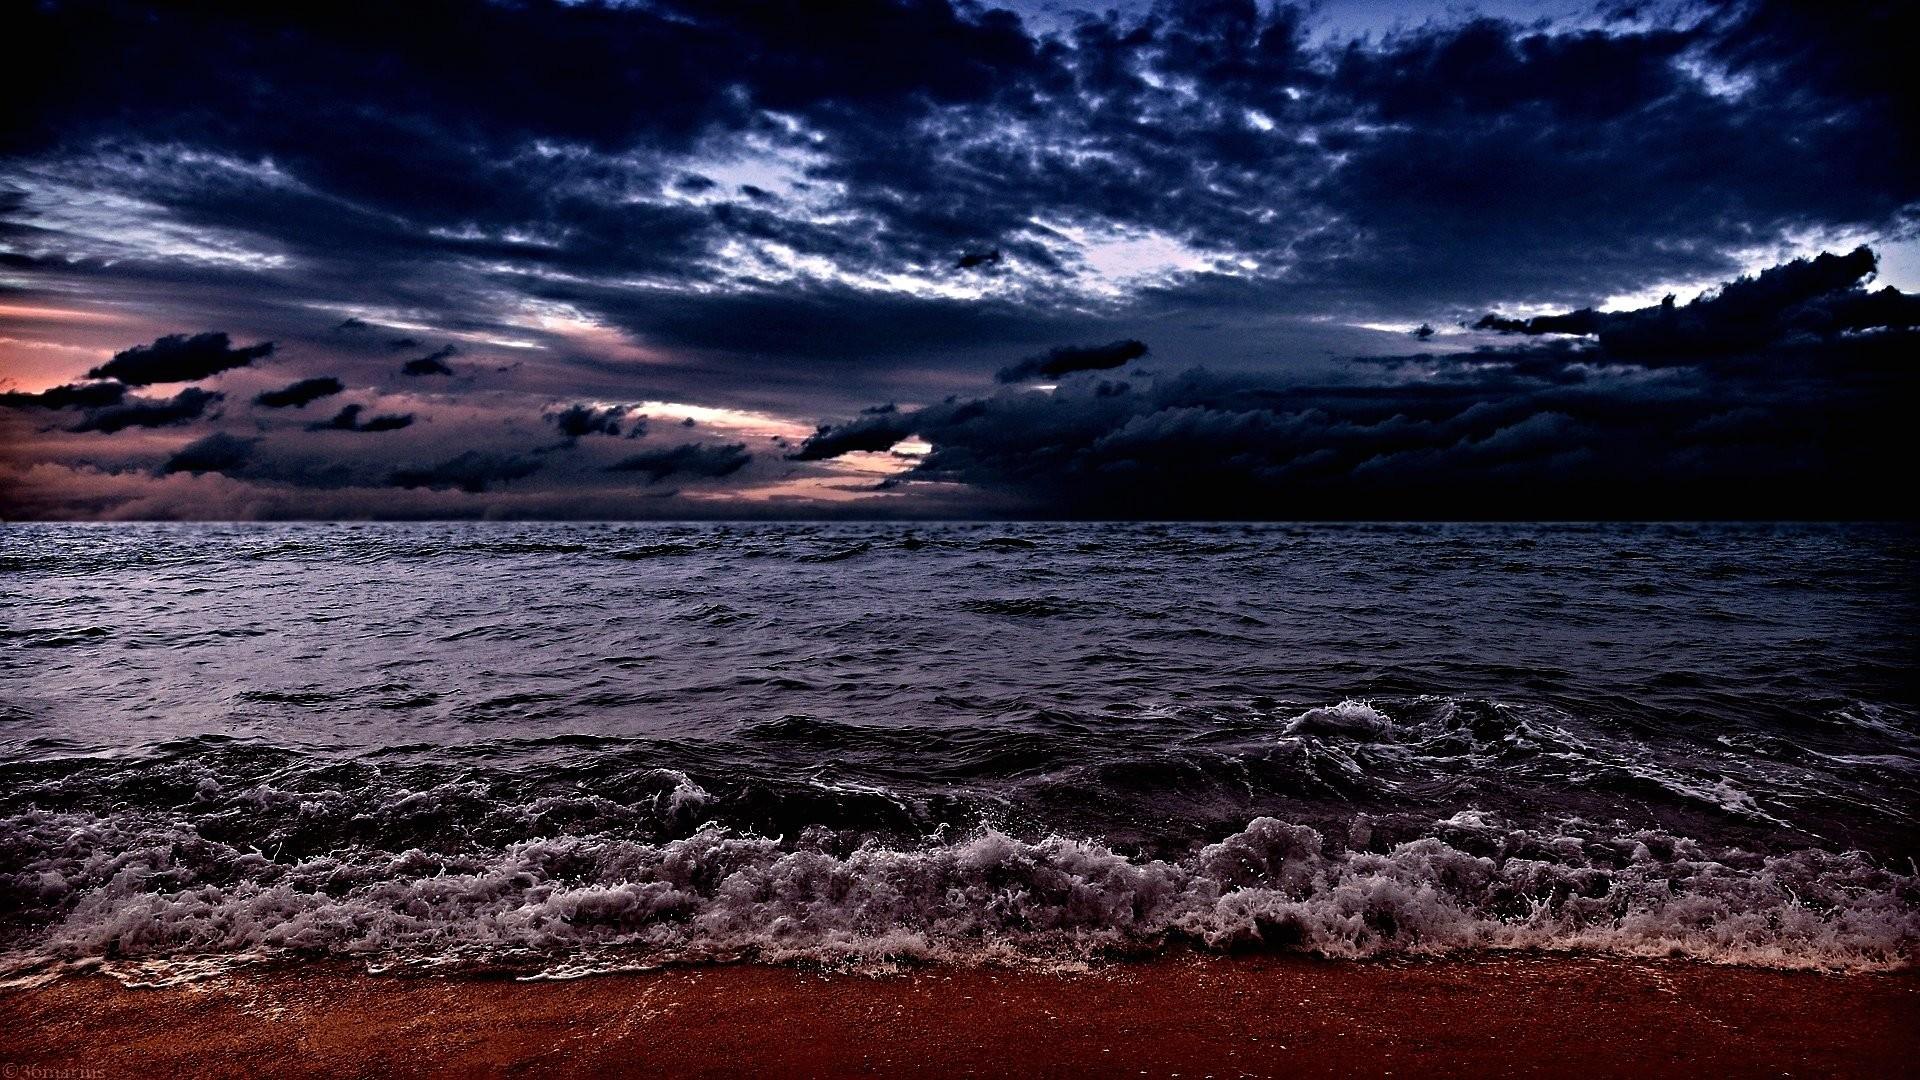 Wallpaper dark ocean 1920 x 1080 full hd